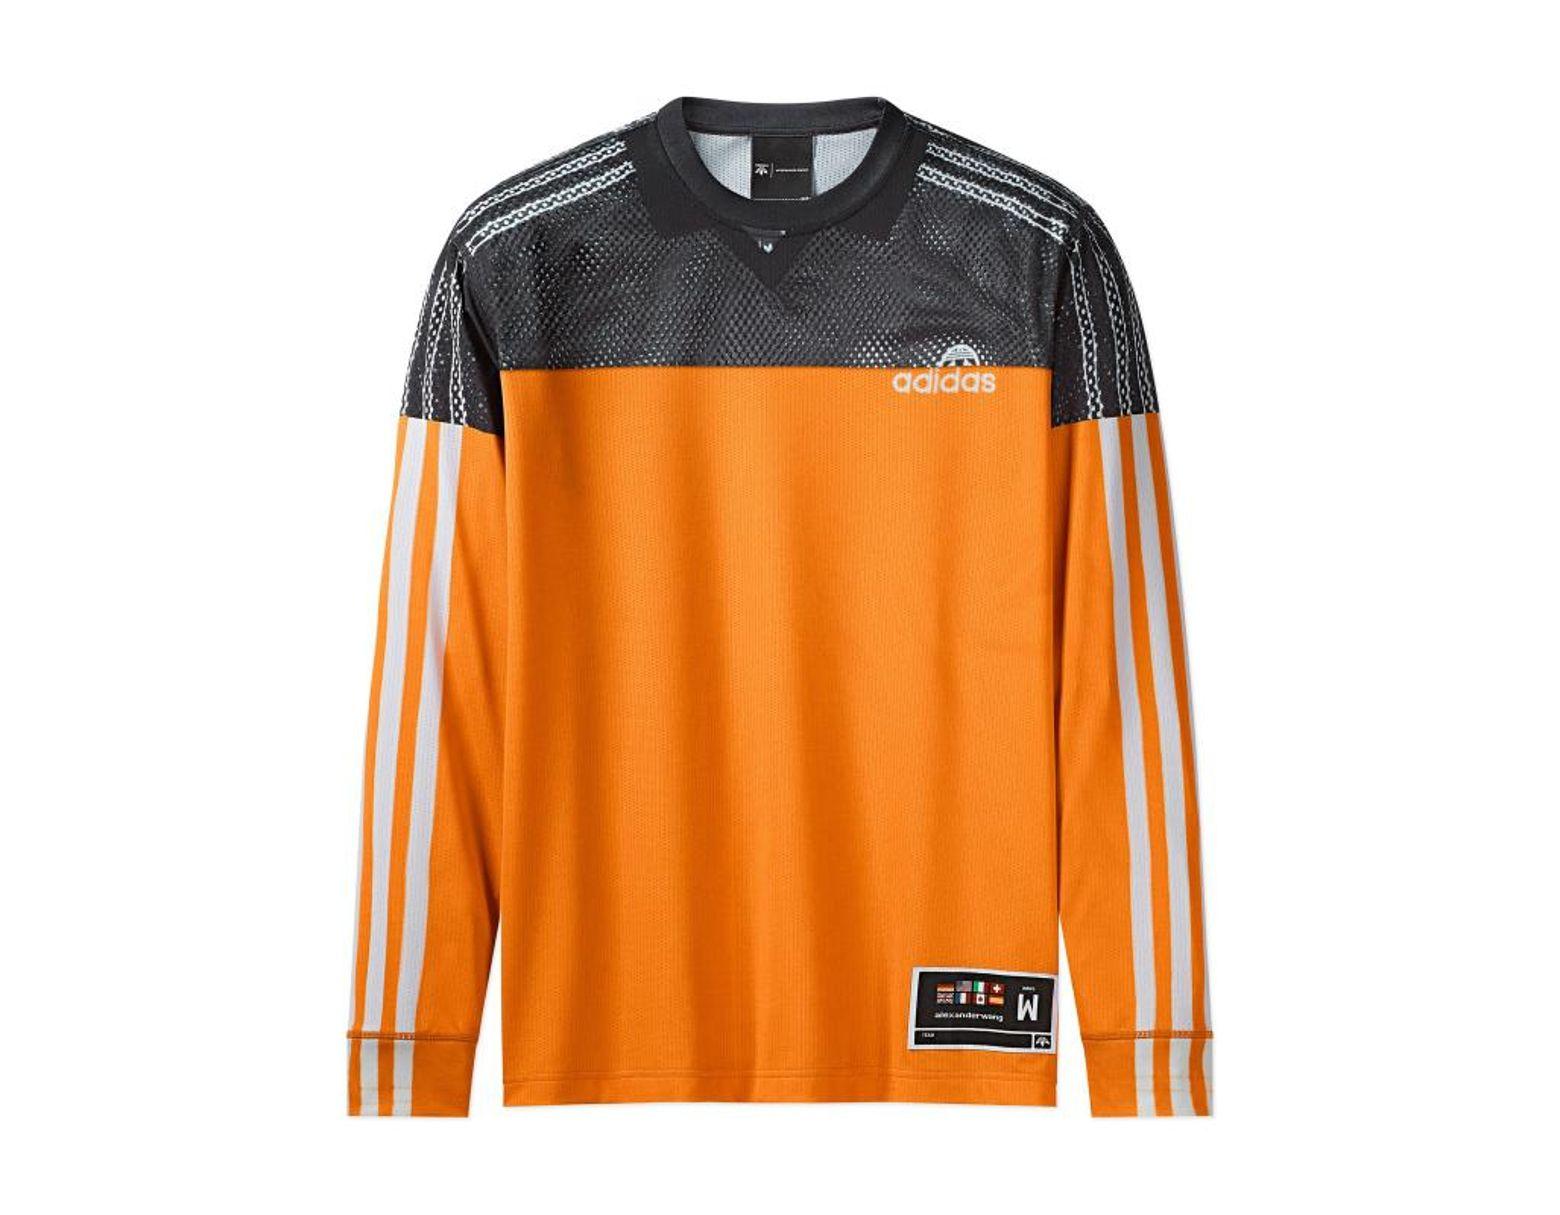 f3b80f89 adidas Originals Alexander Wang Photocopy Long Sleeves T-shirt in Orange  for Men - Lyst